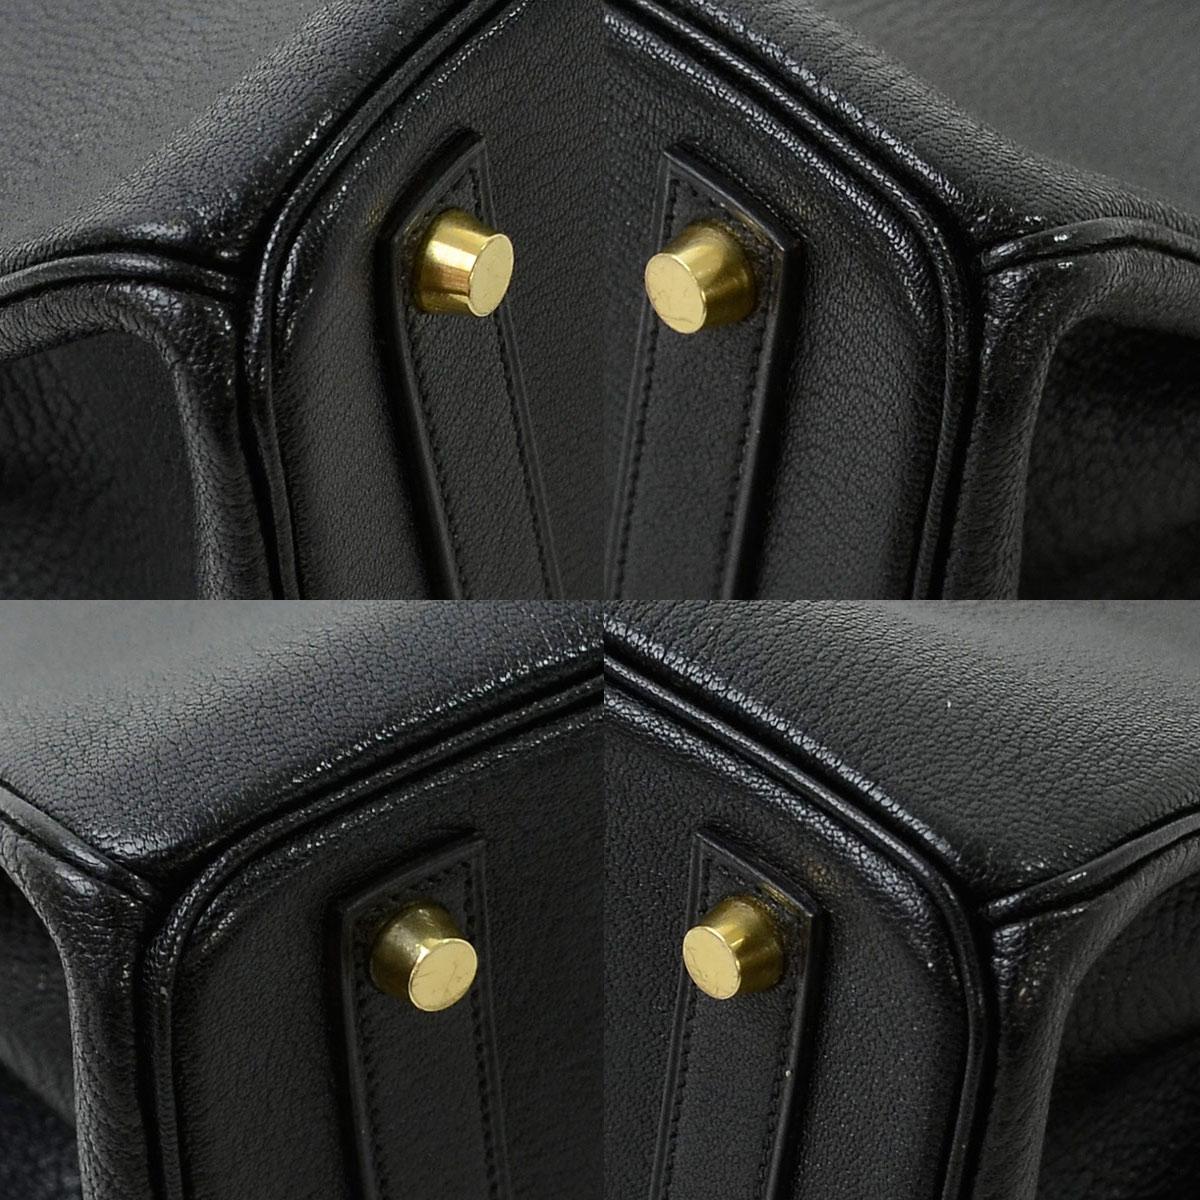 3fc209006374 【おすすめ】 【中古】エルメス【HERMES】 オータクロア32 バッグ ハンドバッグ レディース メンズ ブラックxゴールド金具 コロマンデルレザー